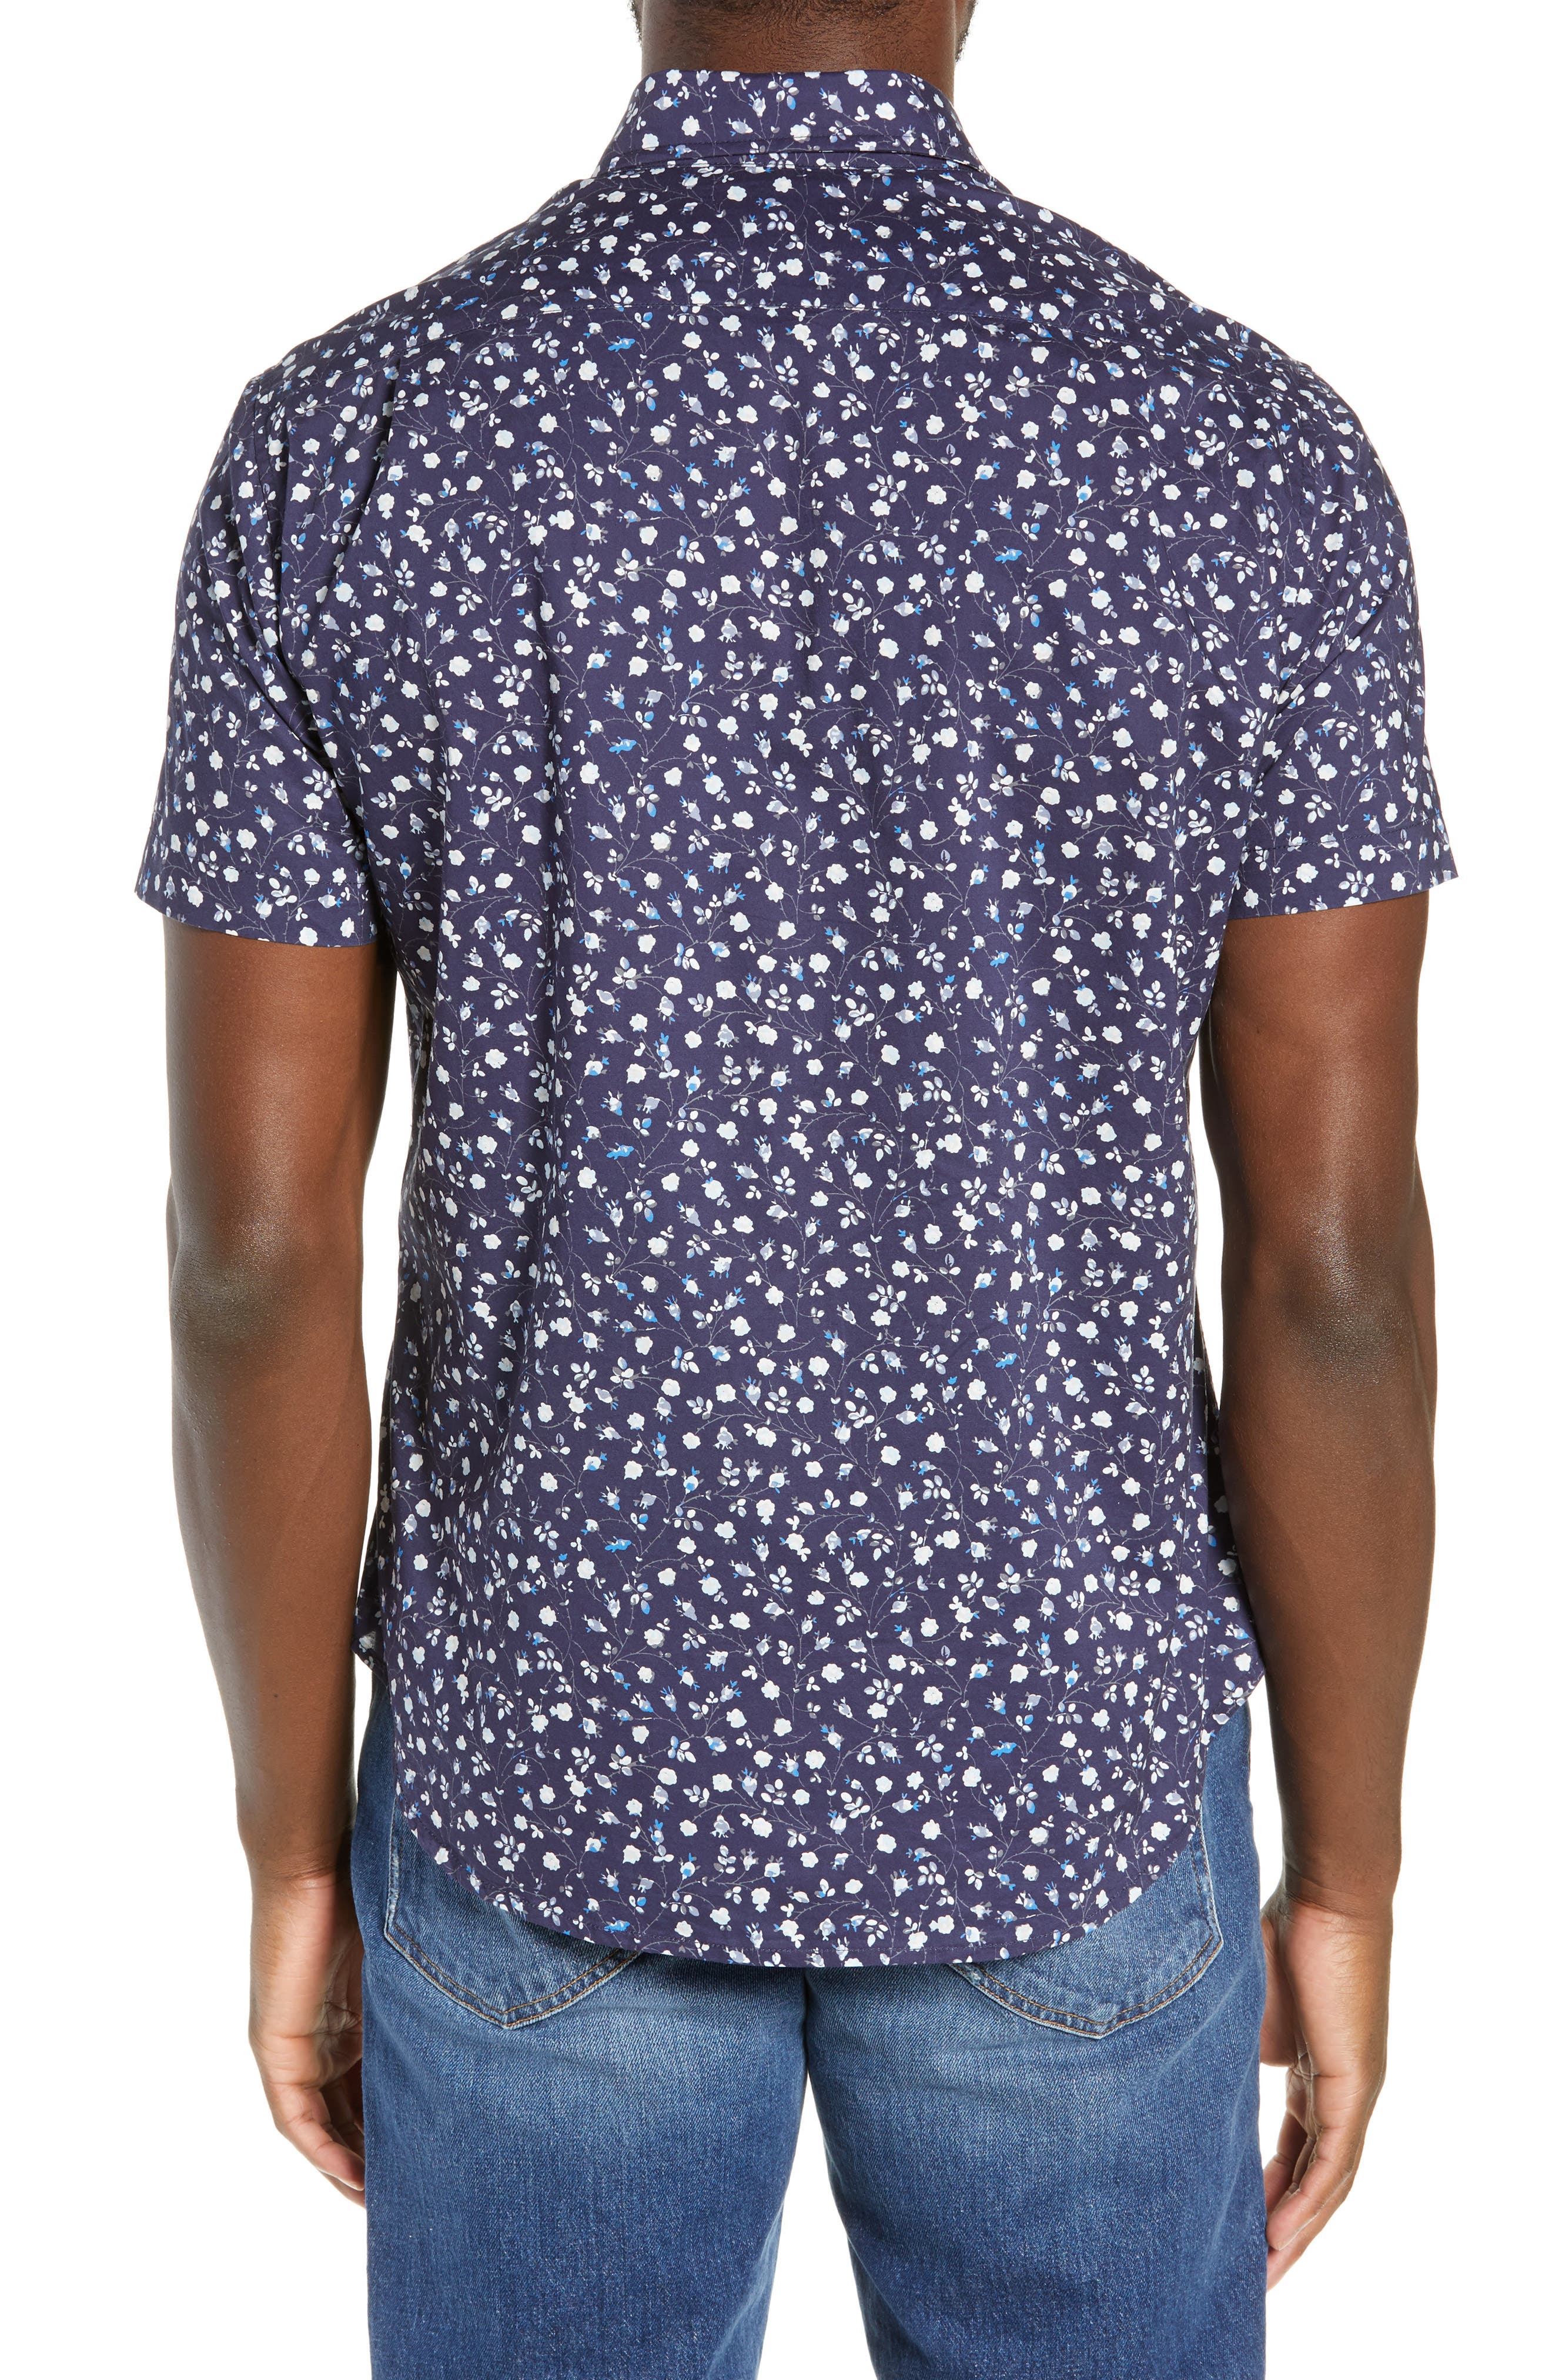 BONOBOS, Riviera Slim Fit Floral Print Sport Shirt, Alternate thumbnail 3, color, BLUE FLORAL